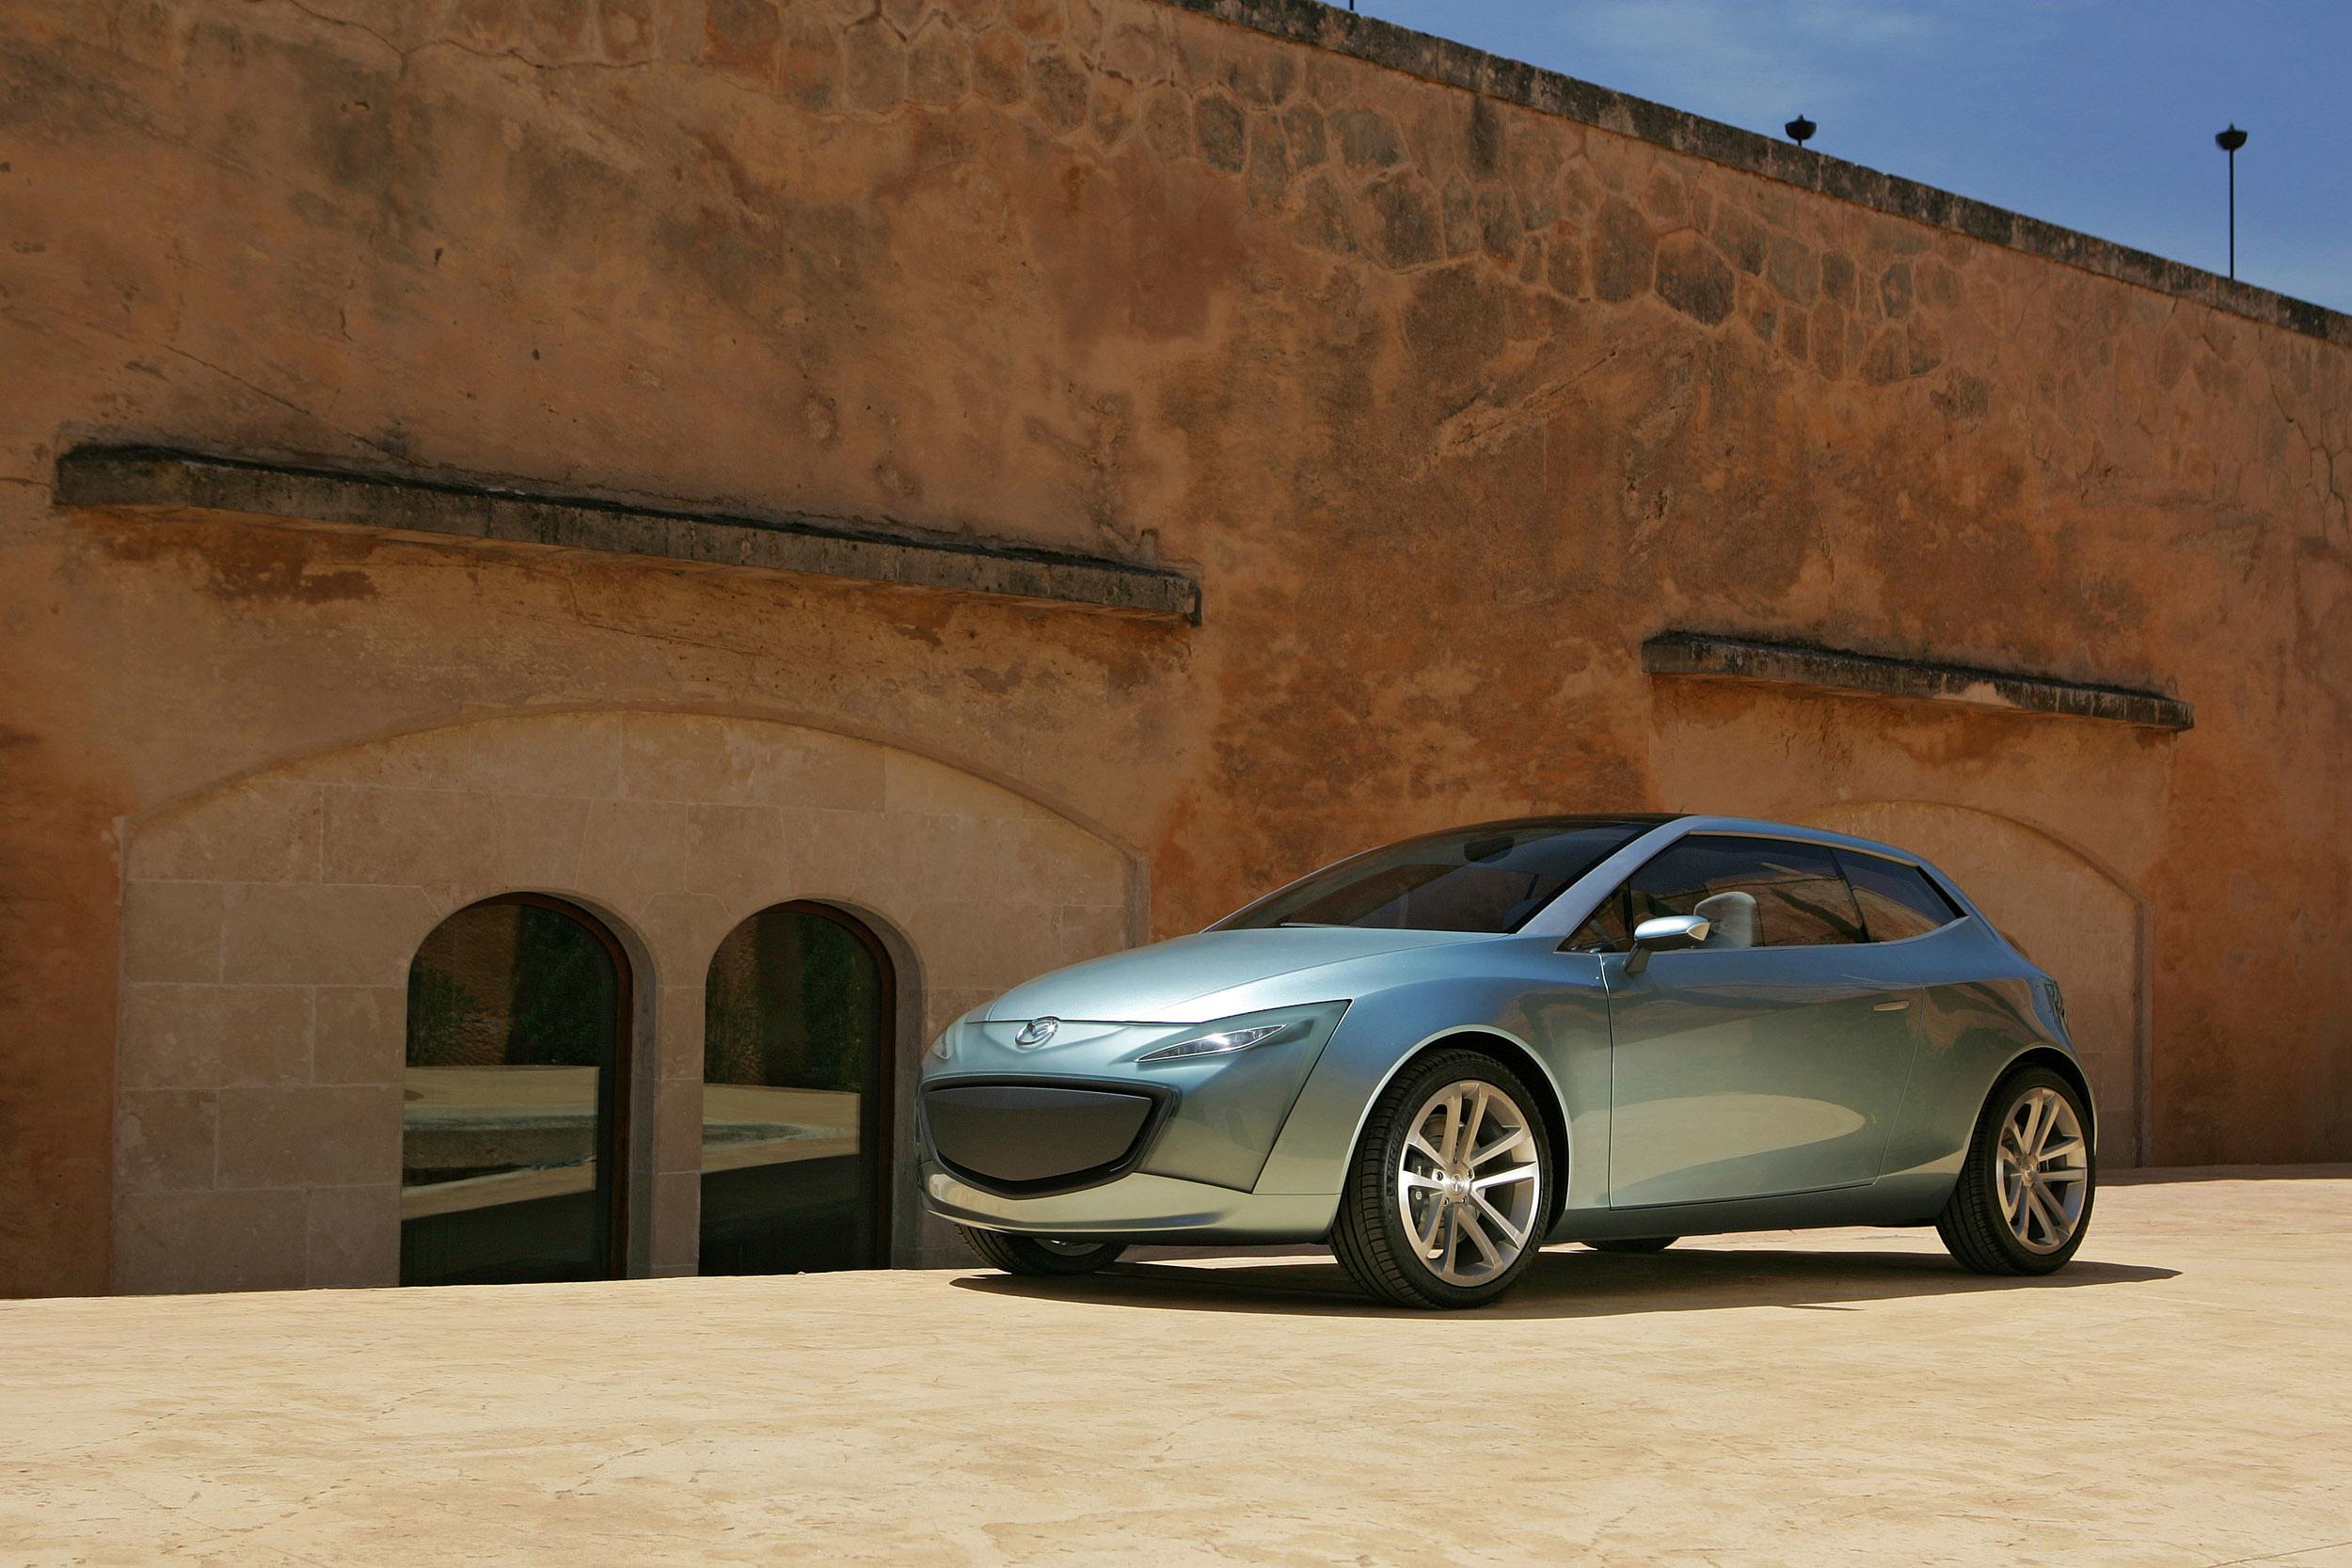 https://www.carsinvasion.com/gallery/2005-mazda-sassou-concept/2005-mazda-sassou-concept-10.jpg